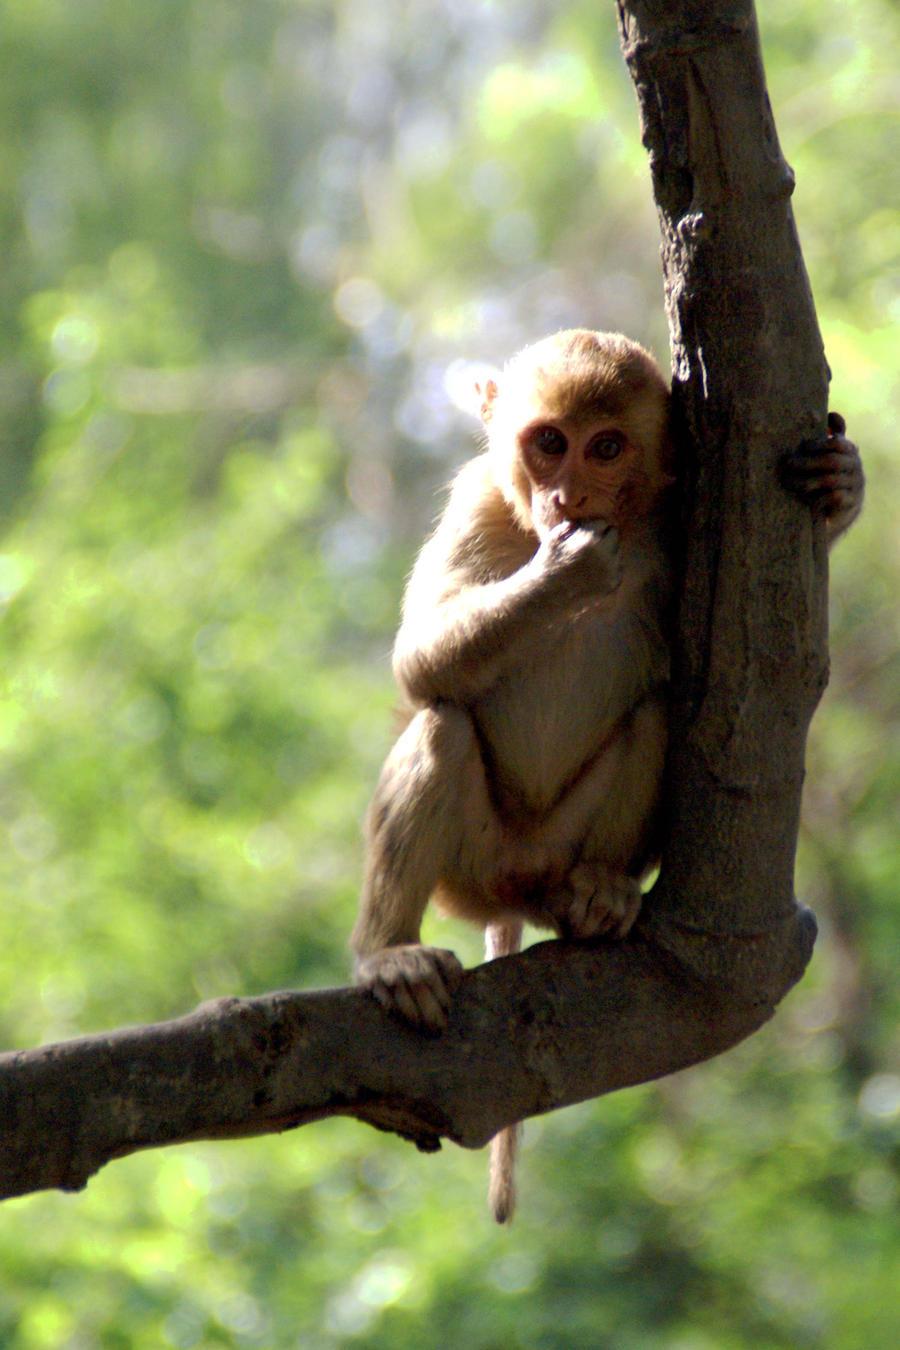 Curious little monkey by Art-by-Jilani